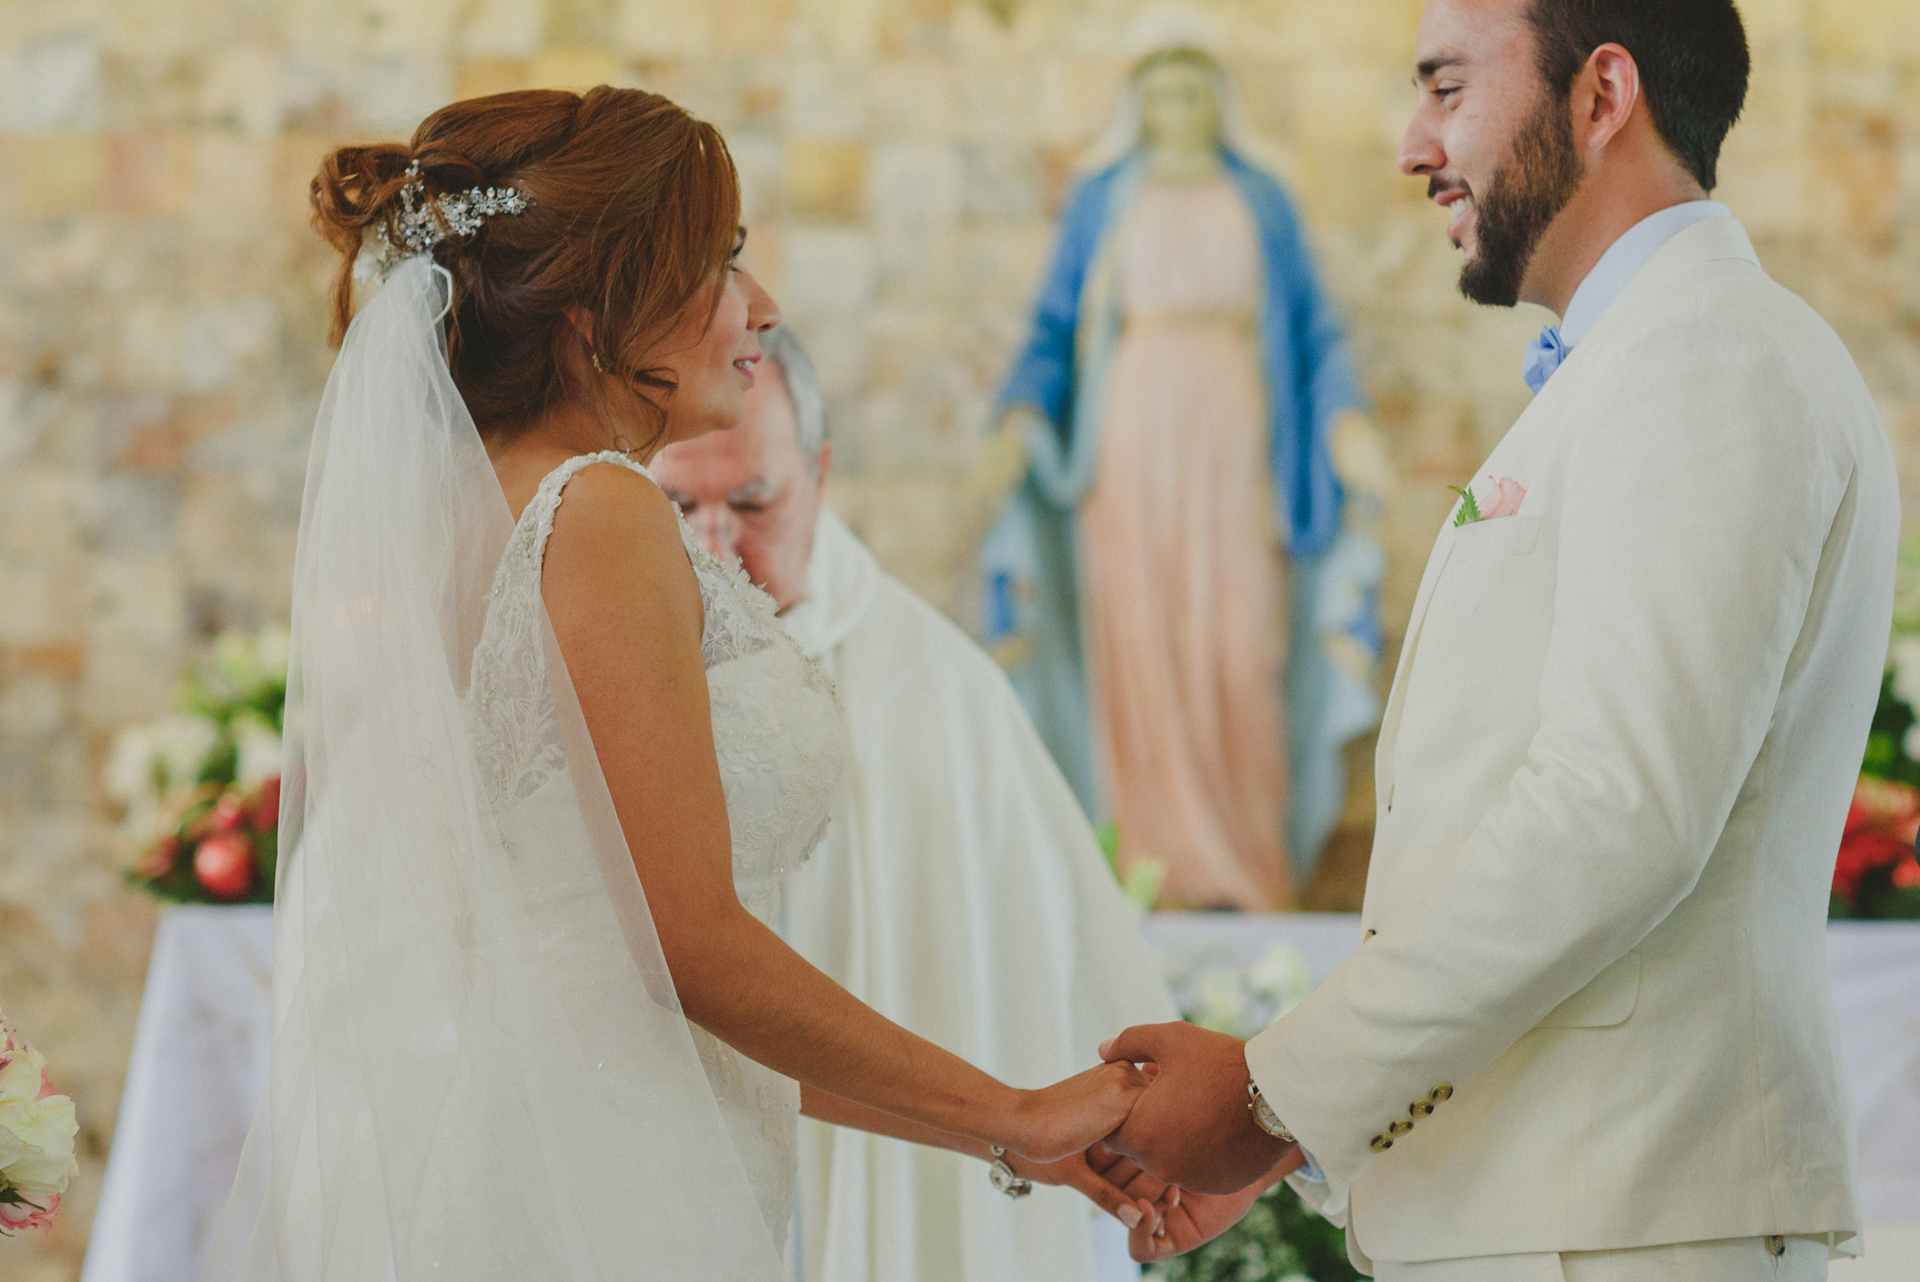 Wedding N&M BLOG luishoudin.com (45 de 174)